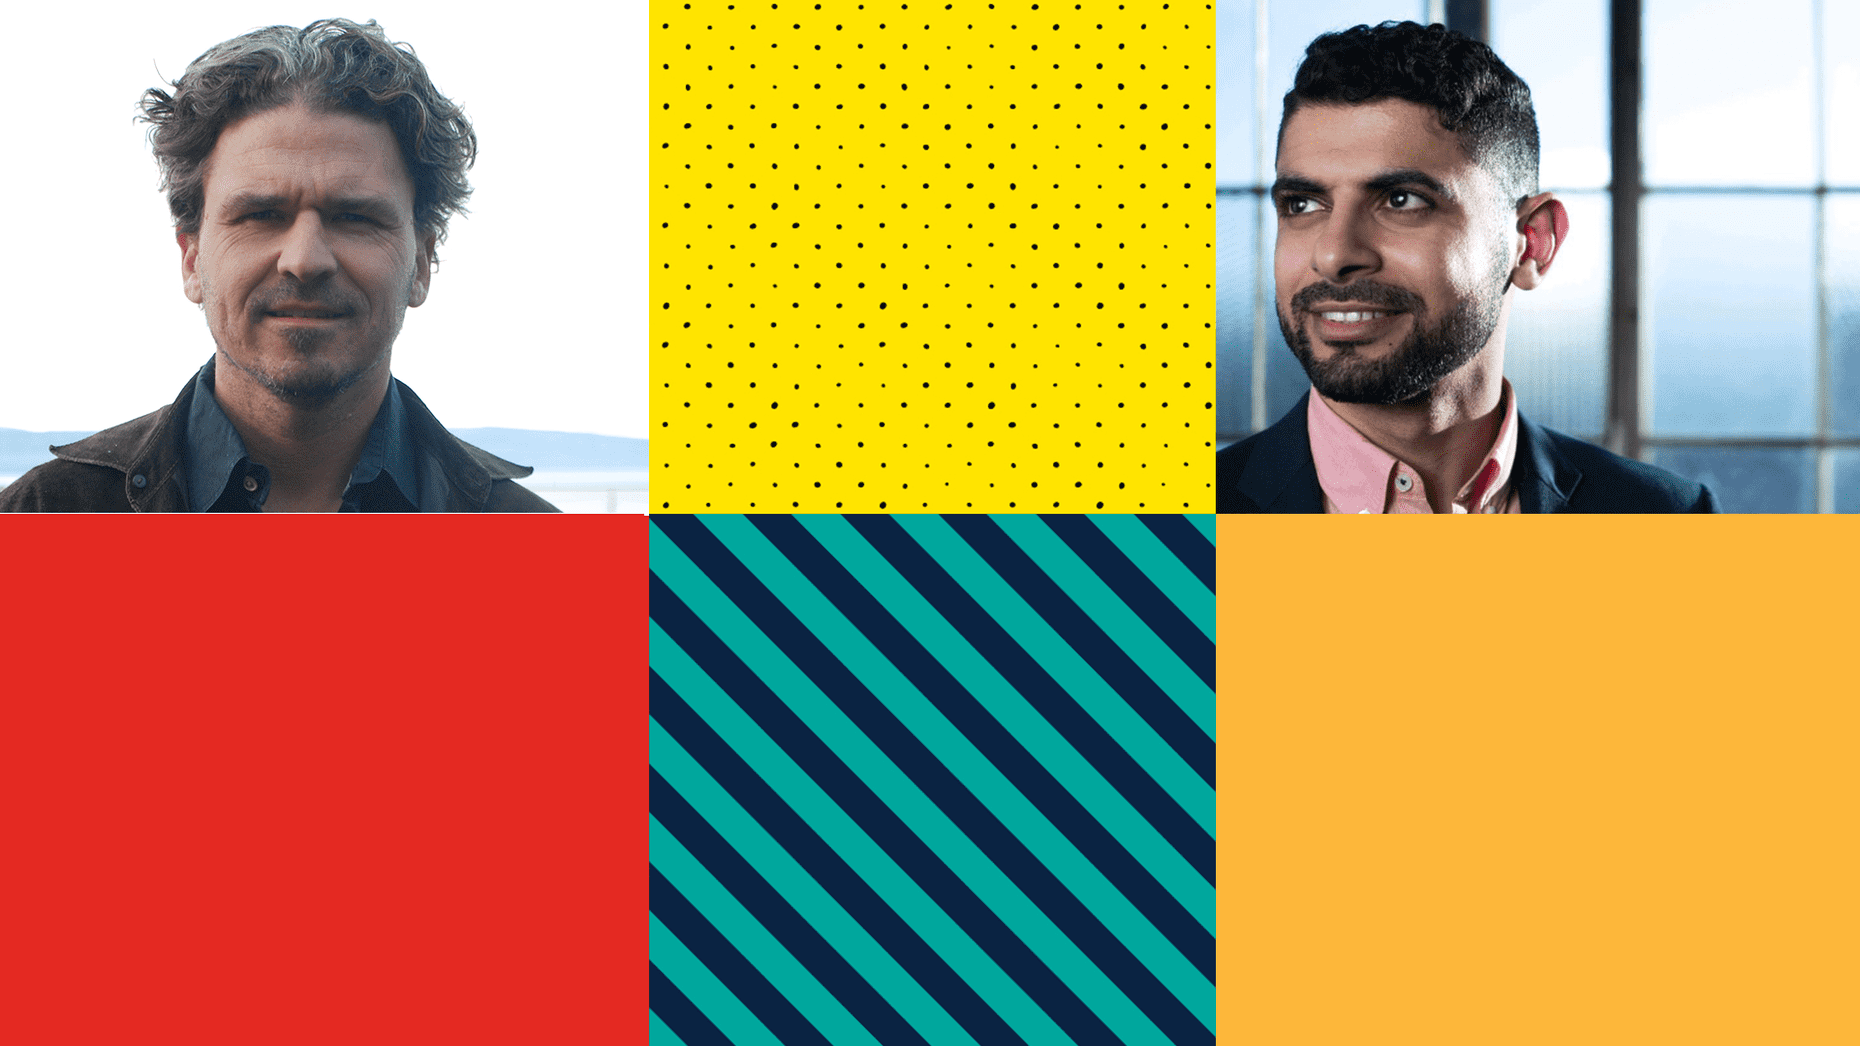 PEN World Voices: Dave Eggers and Mokhtar Alkhanshali